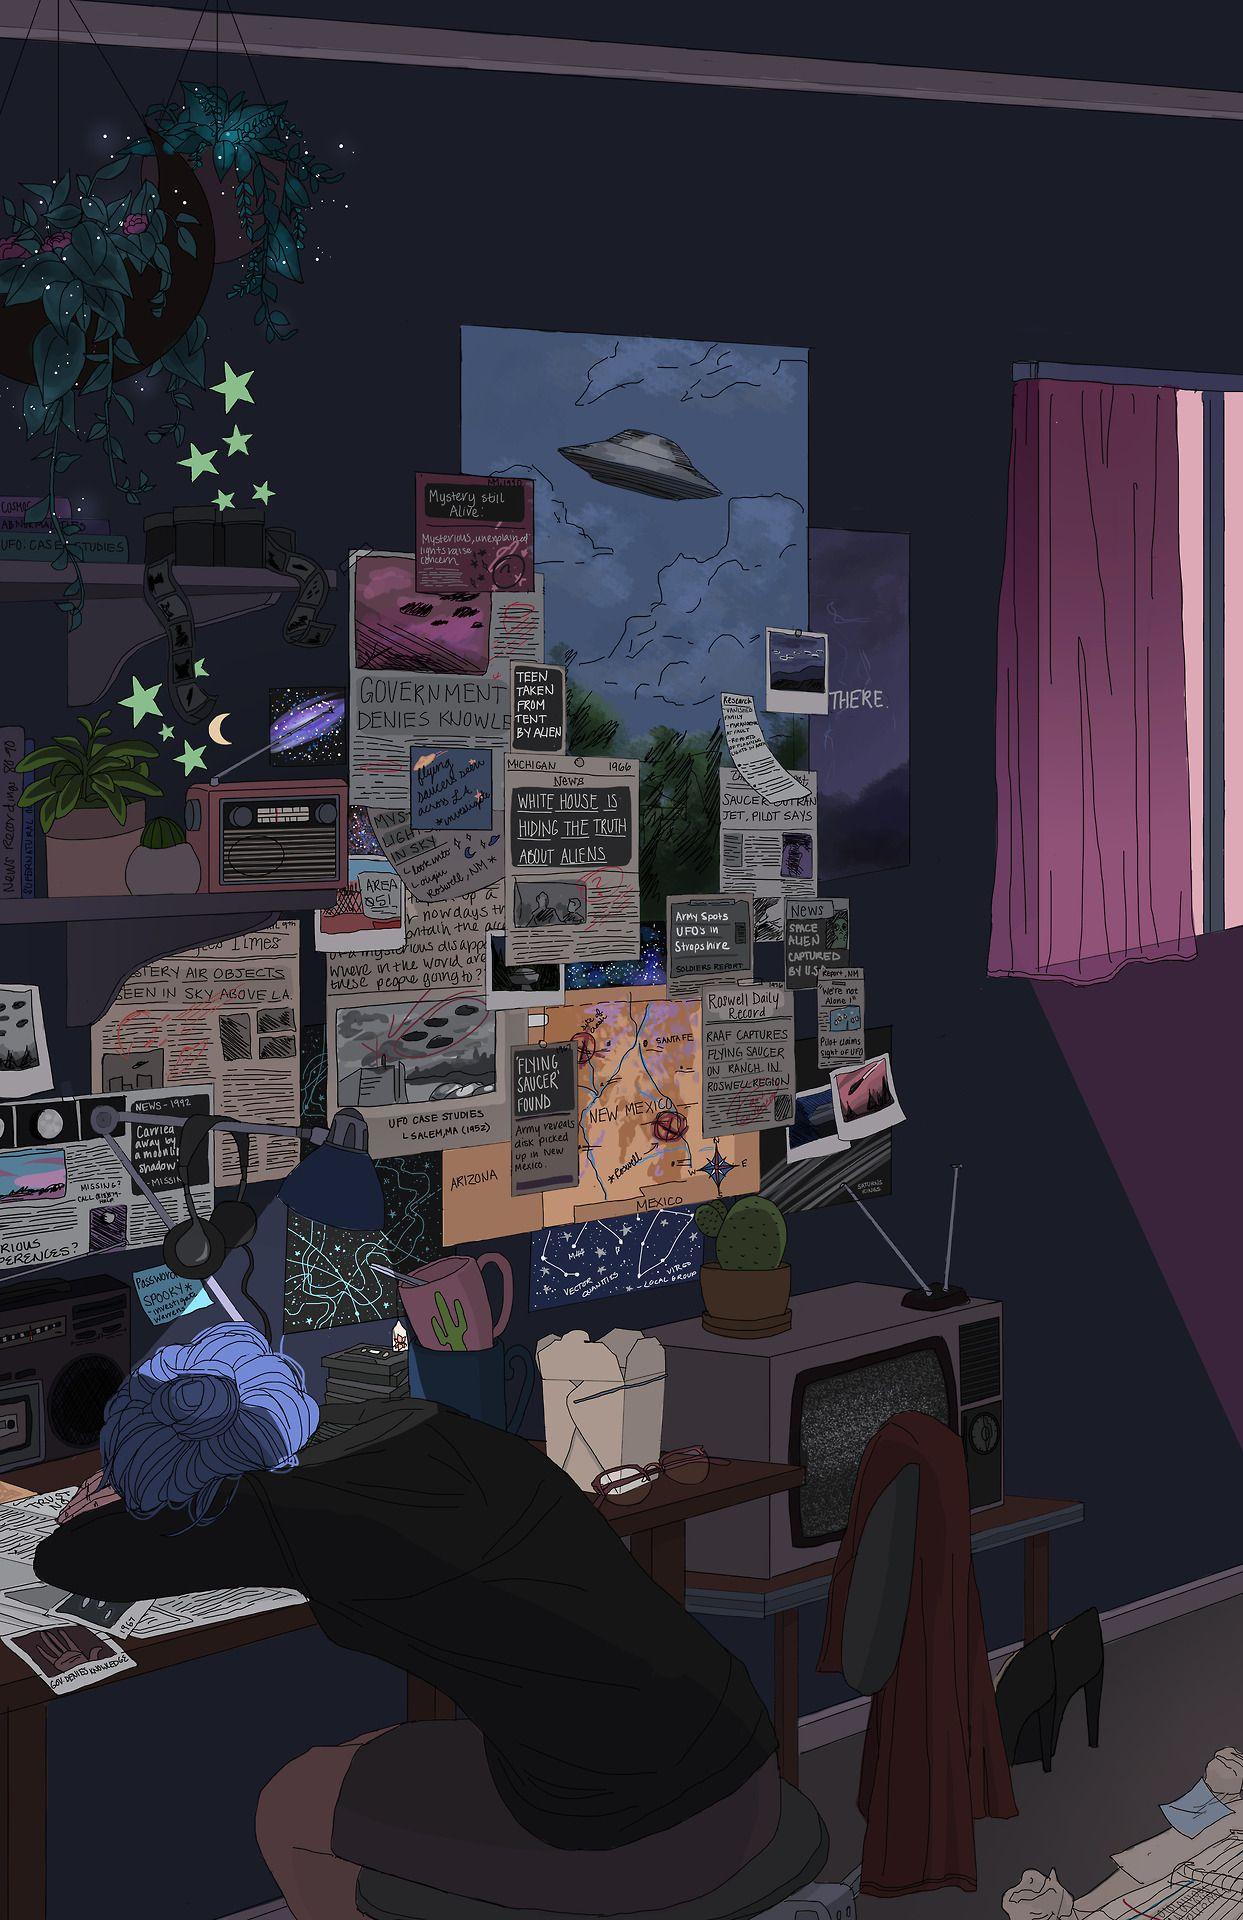 Fantastic Wallpaper Anime Aesthetic - 7cd24ddc2daea75016af2e04550161ef  Snapshot_772274      .jpg